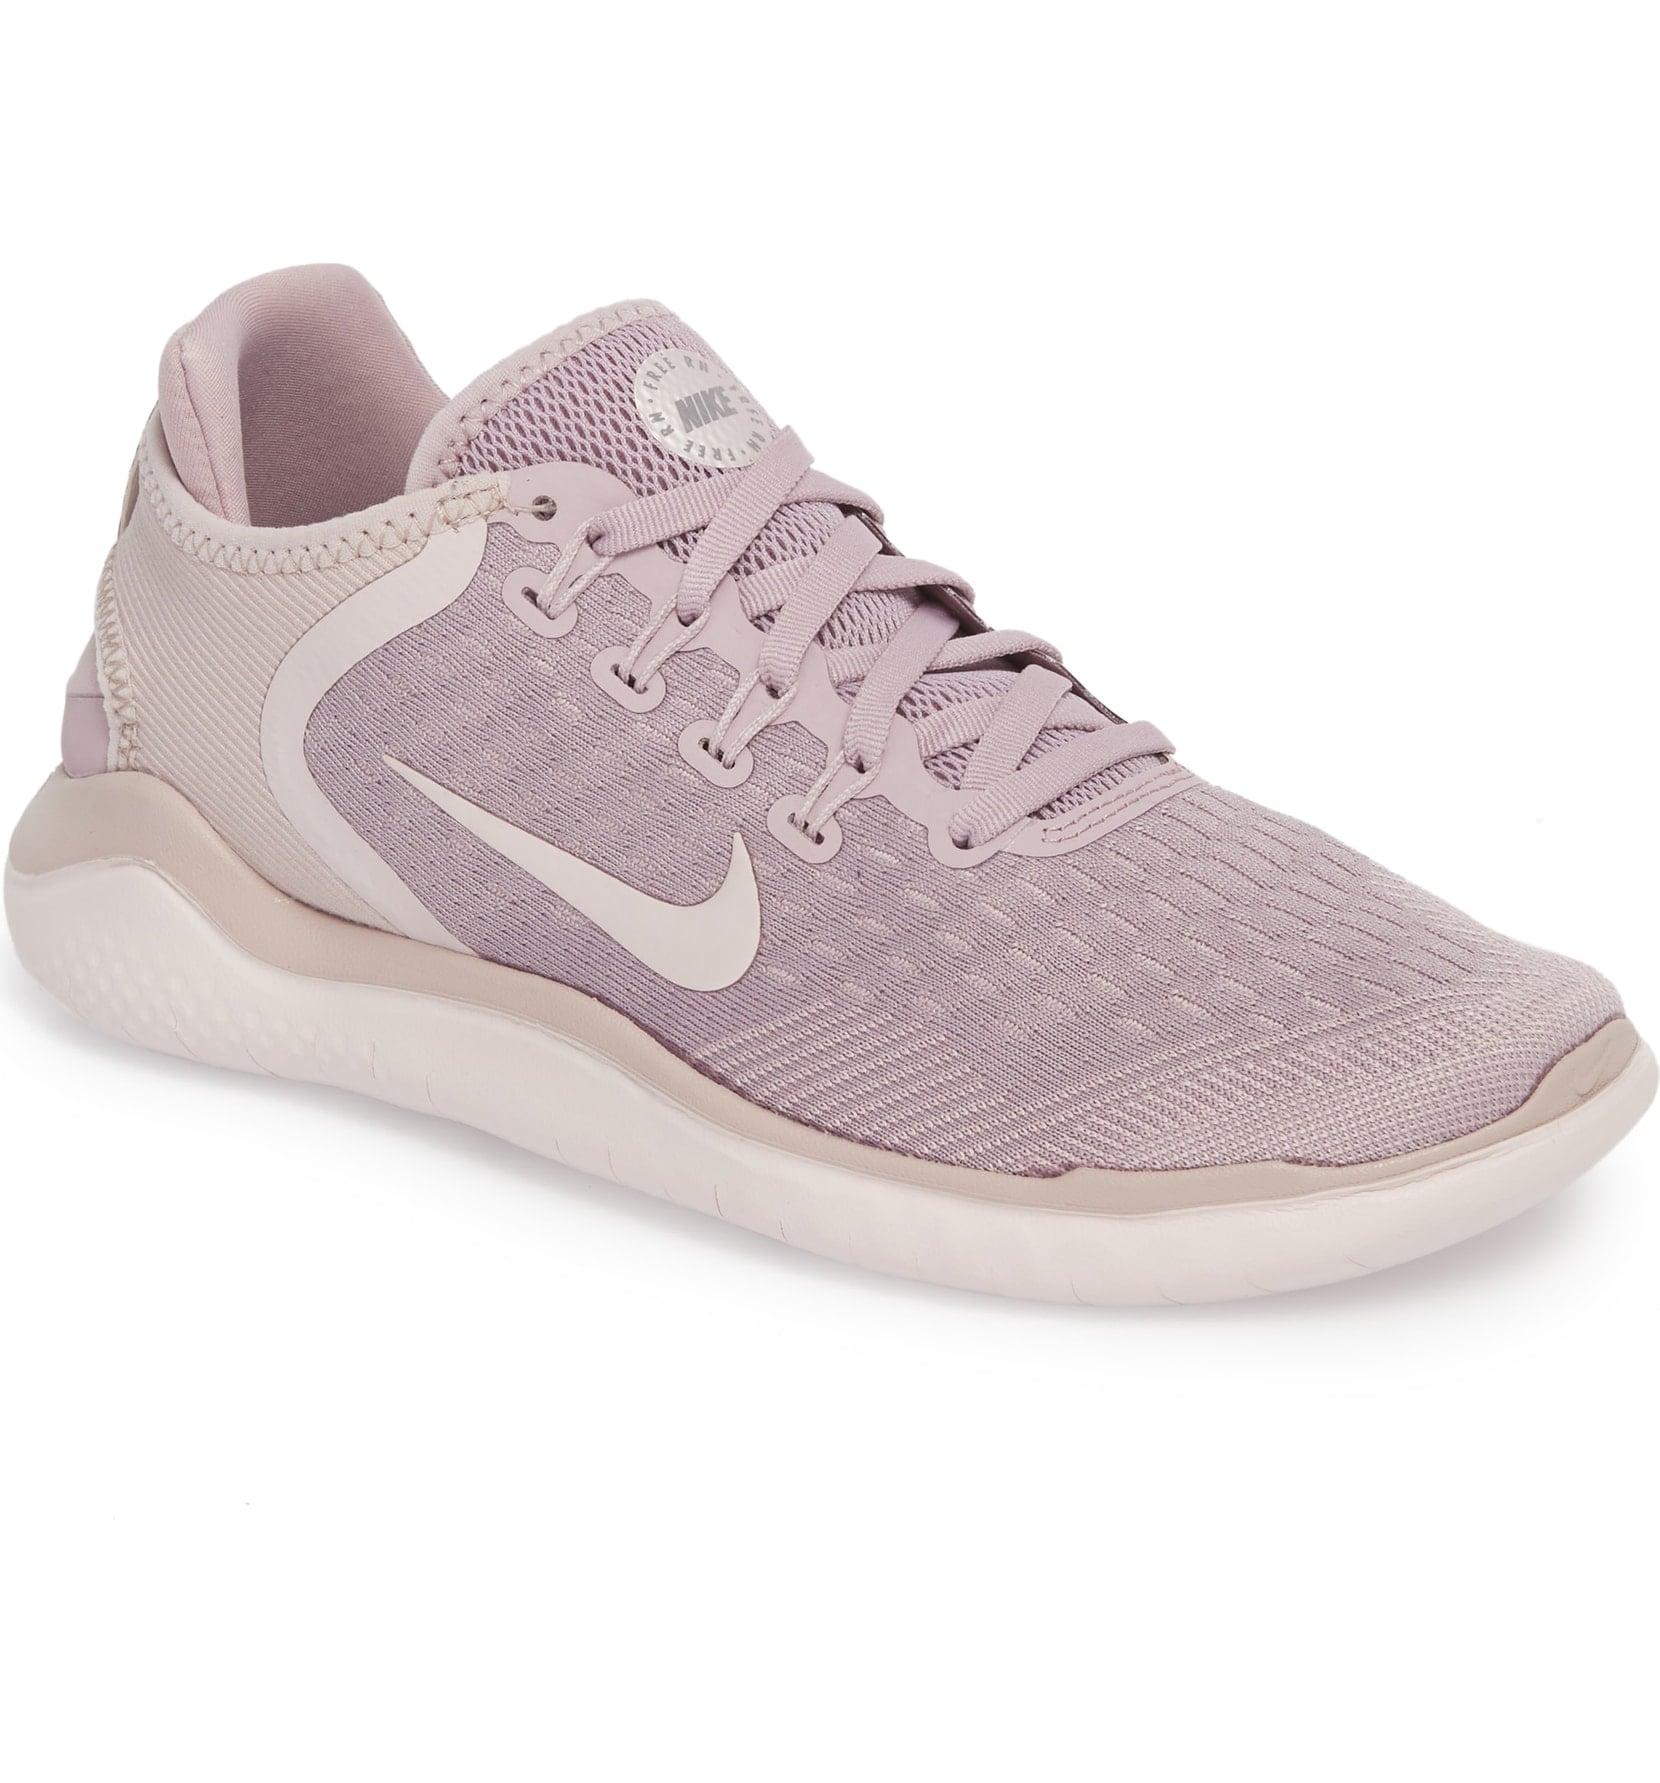 Nike Free RN 2018 Running Shoes   Stop